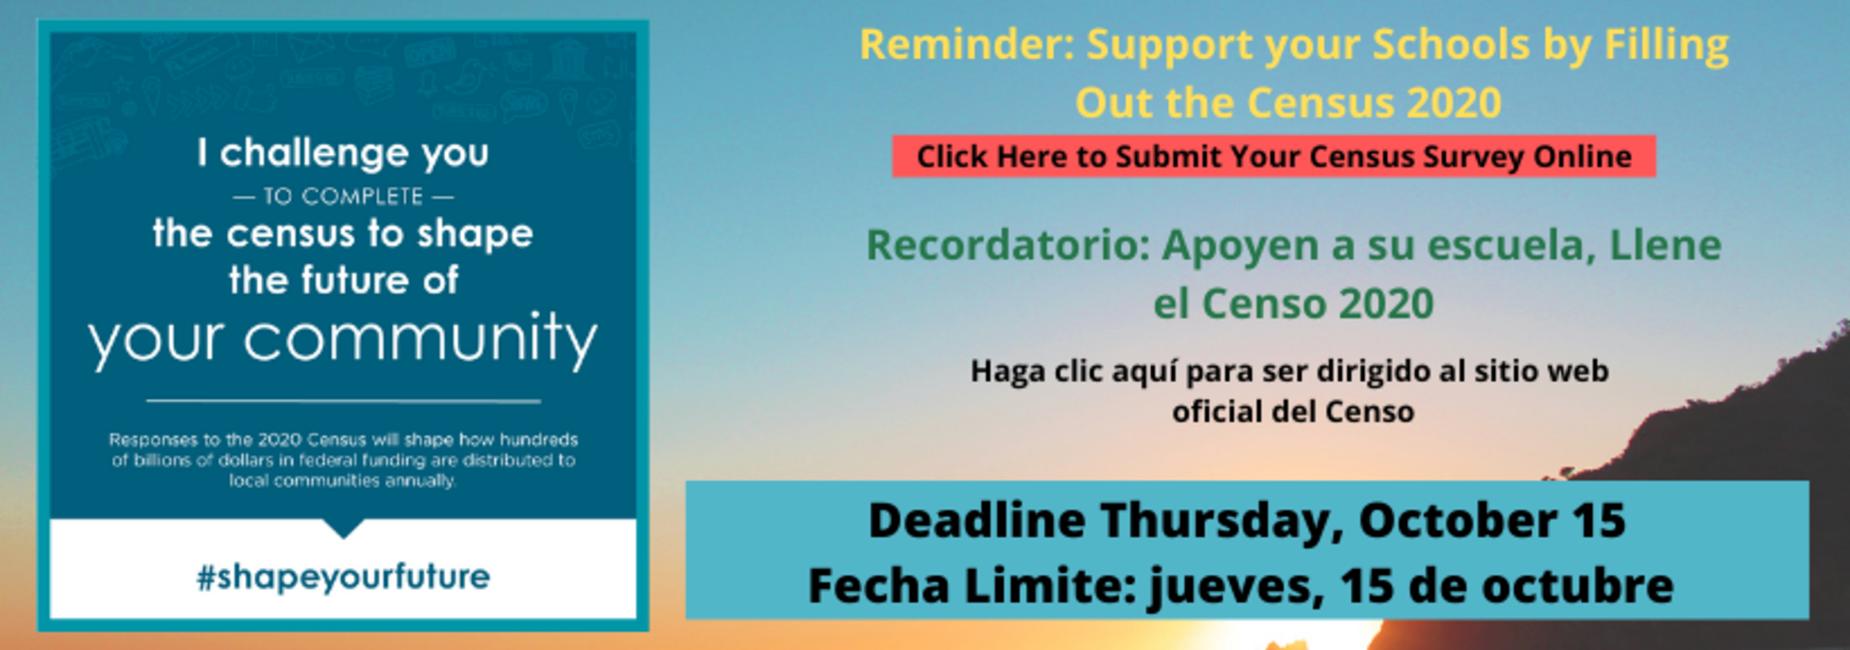 Census Banner Bilingual with October 15 Deadline